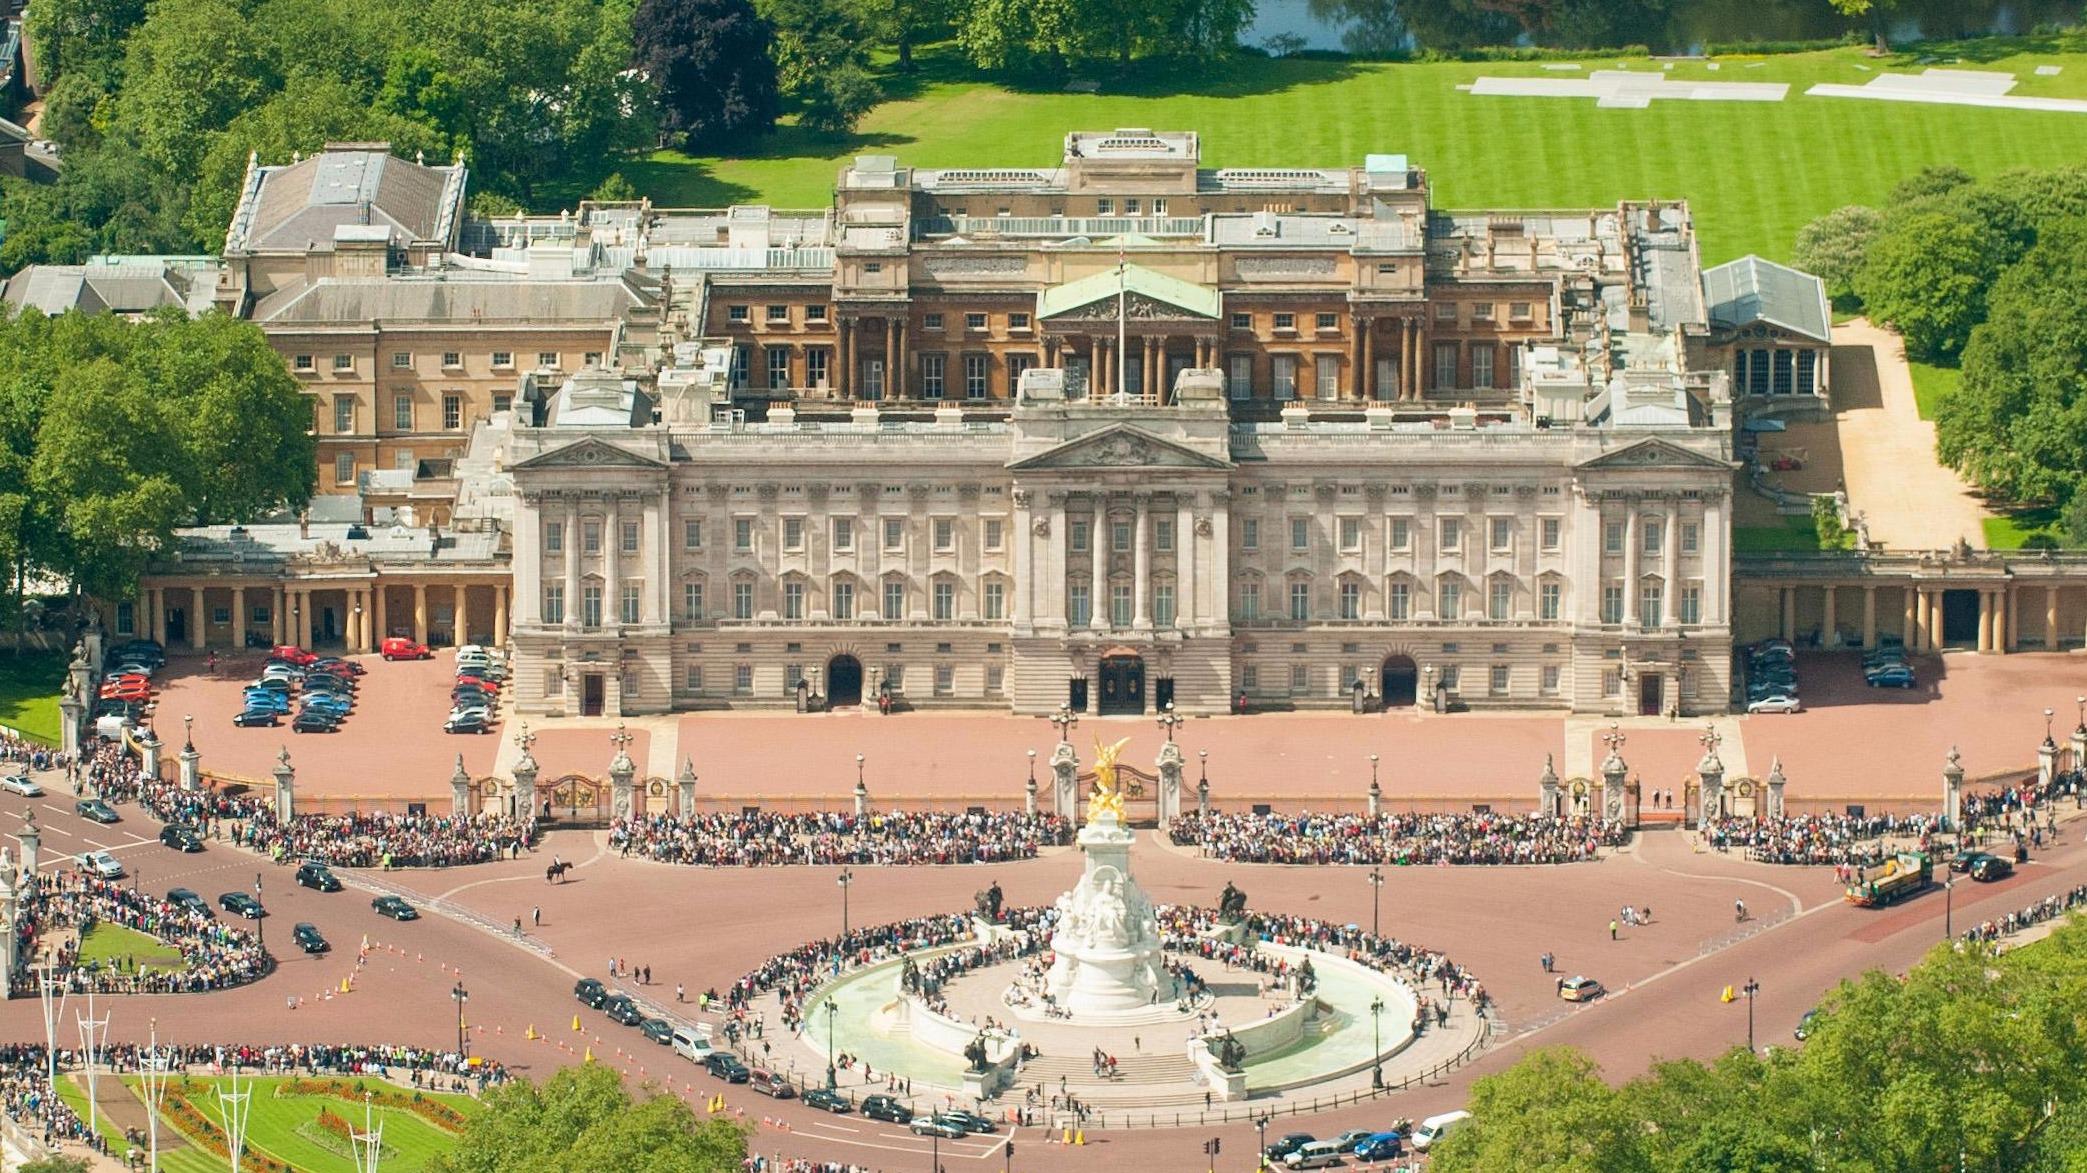 imagen de vista aérea del Palacio de Buckingham, Londres, Inglaterra